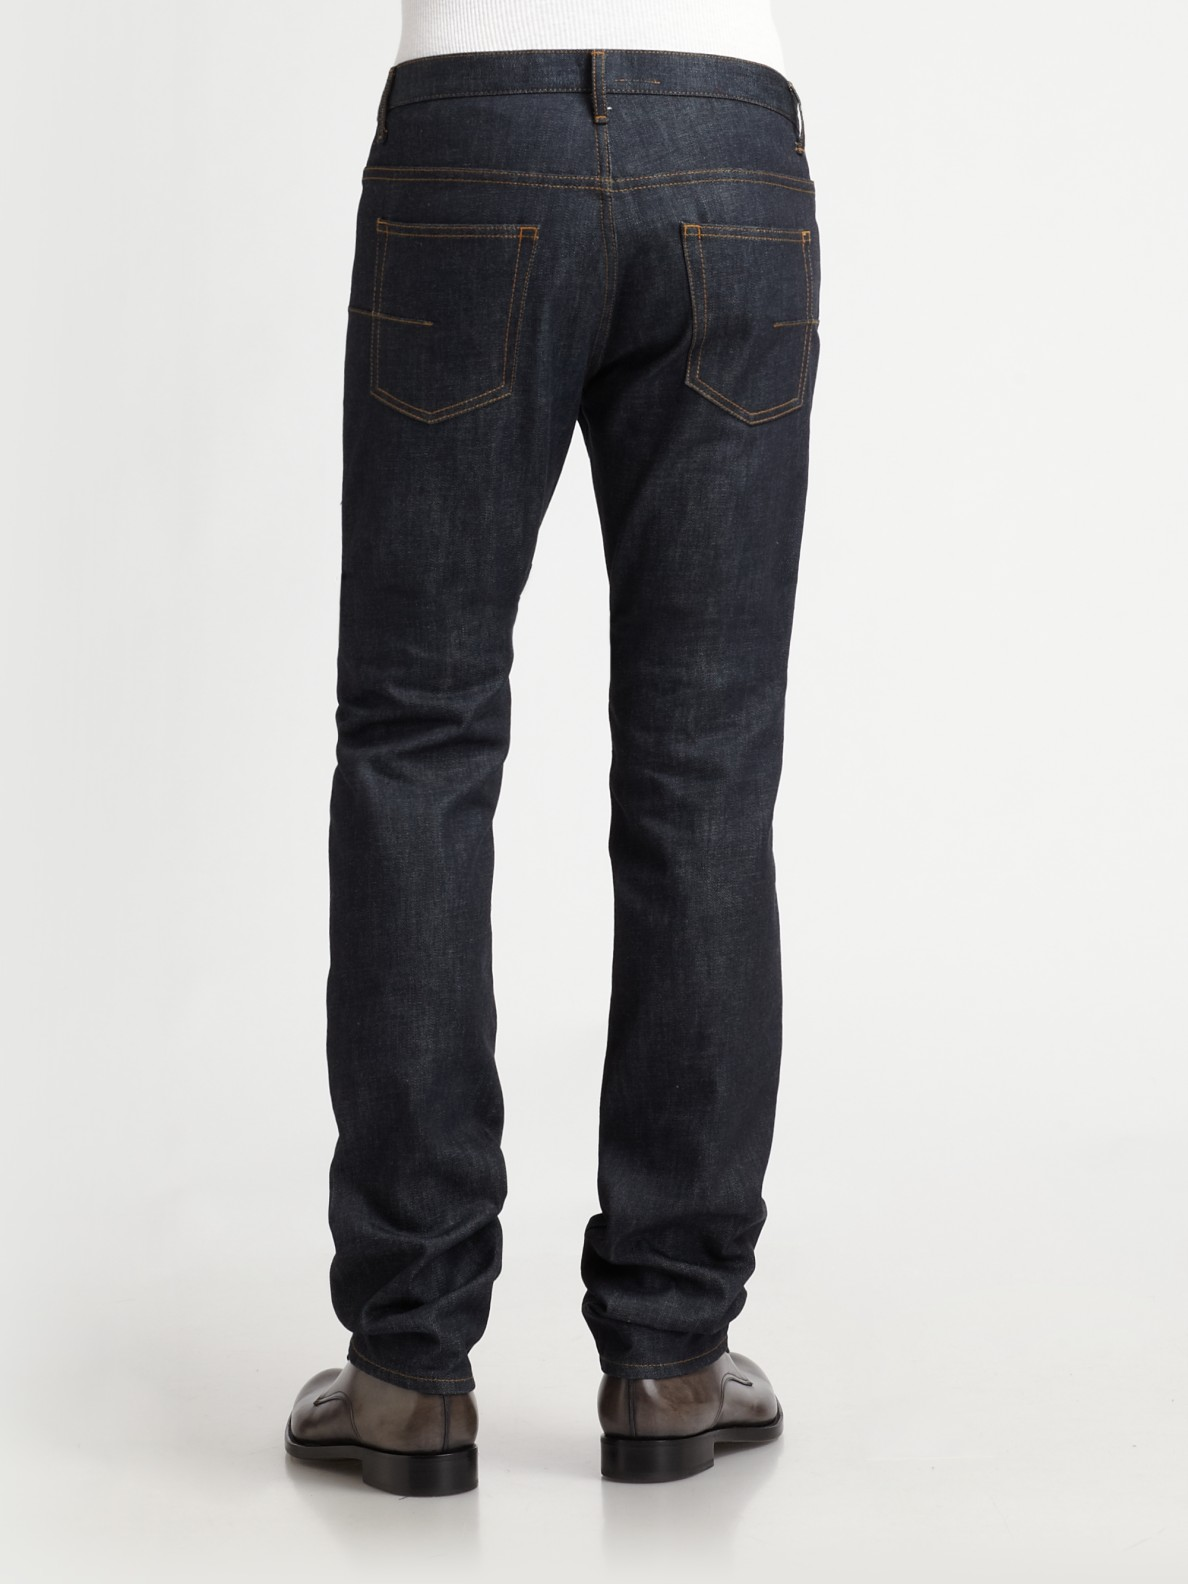 dior homme straight leg jeans in blue for men lyst. Black Bedroom Furniture Sets. Home Design Ideas